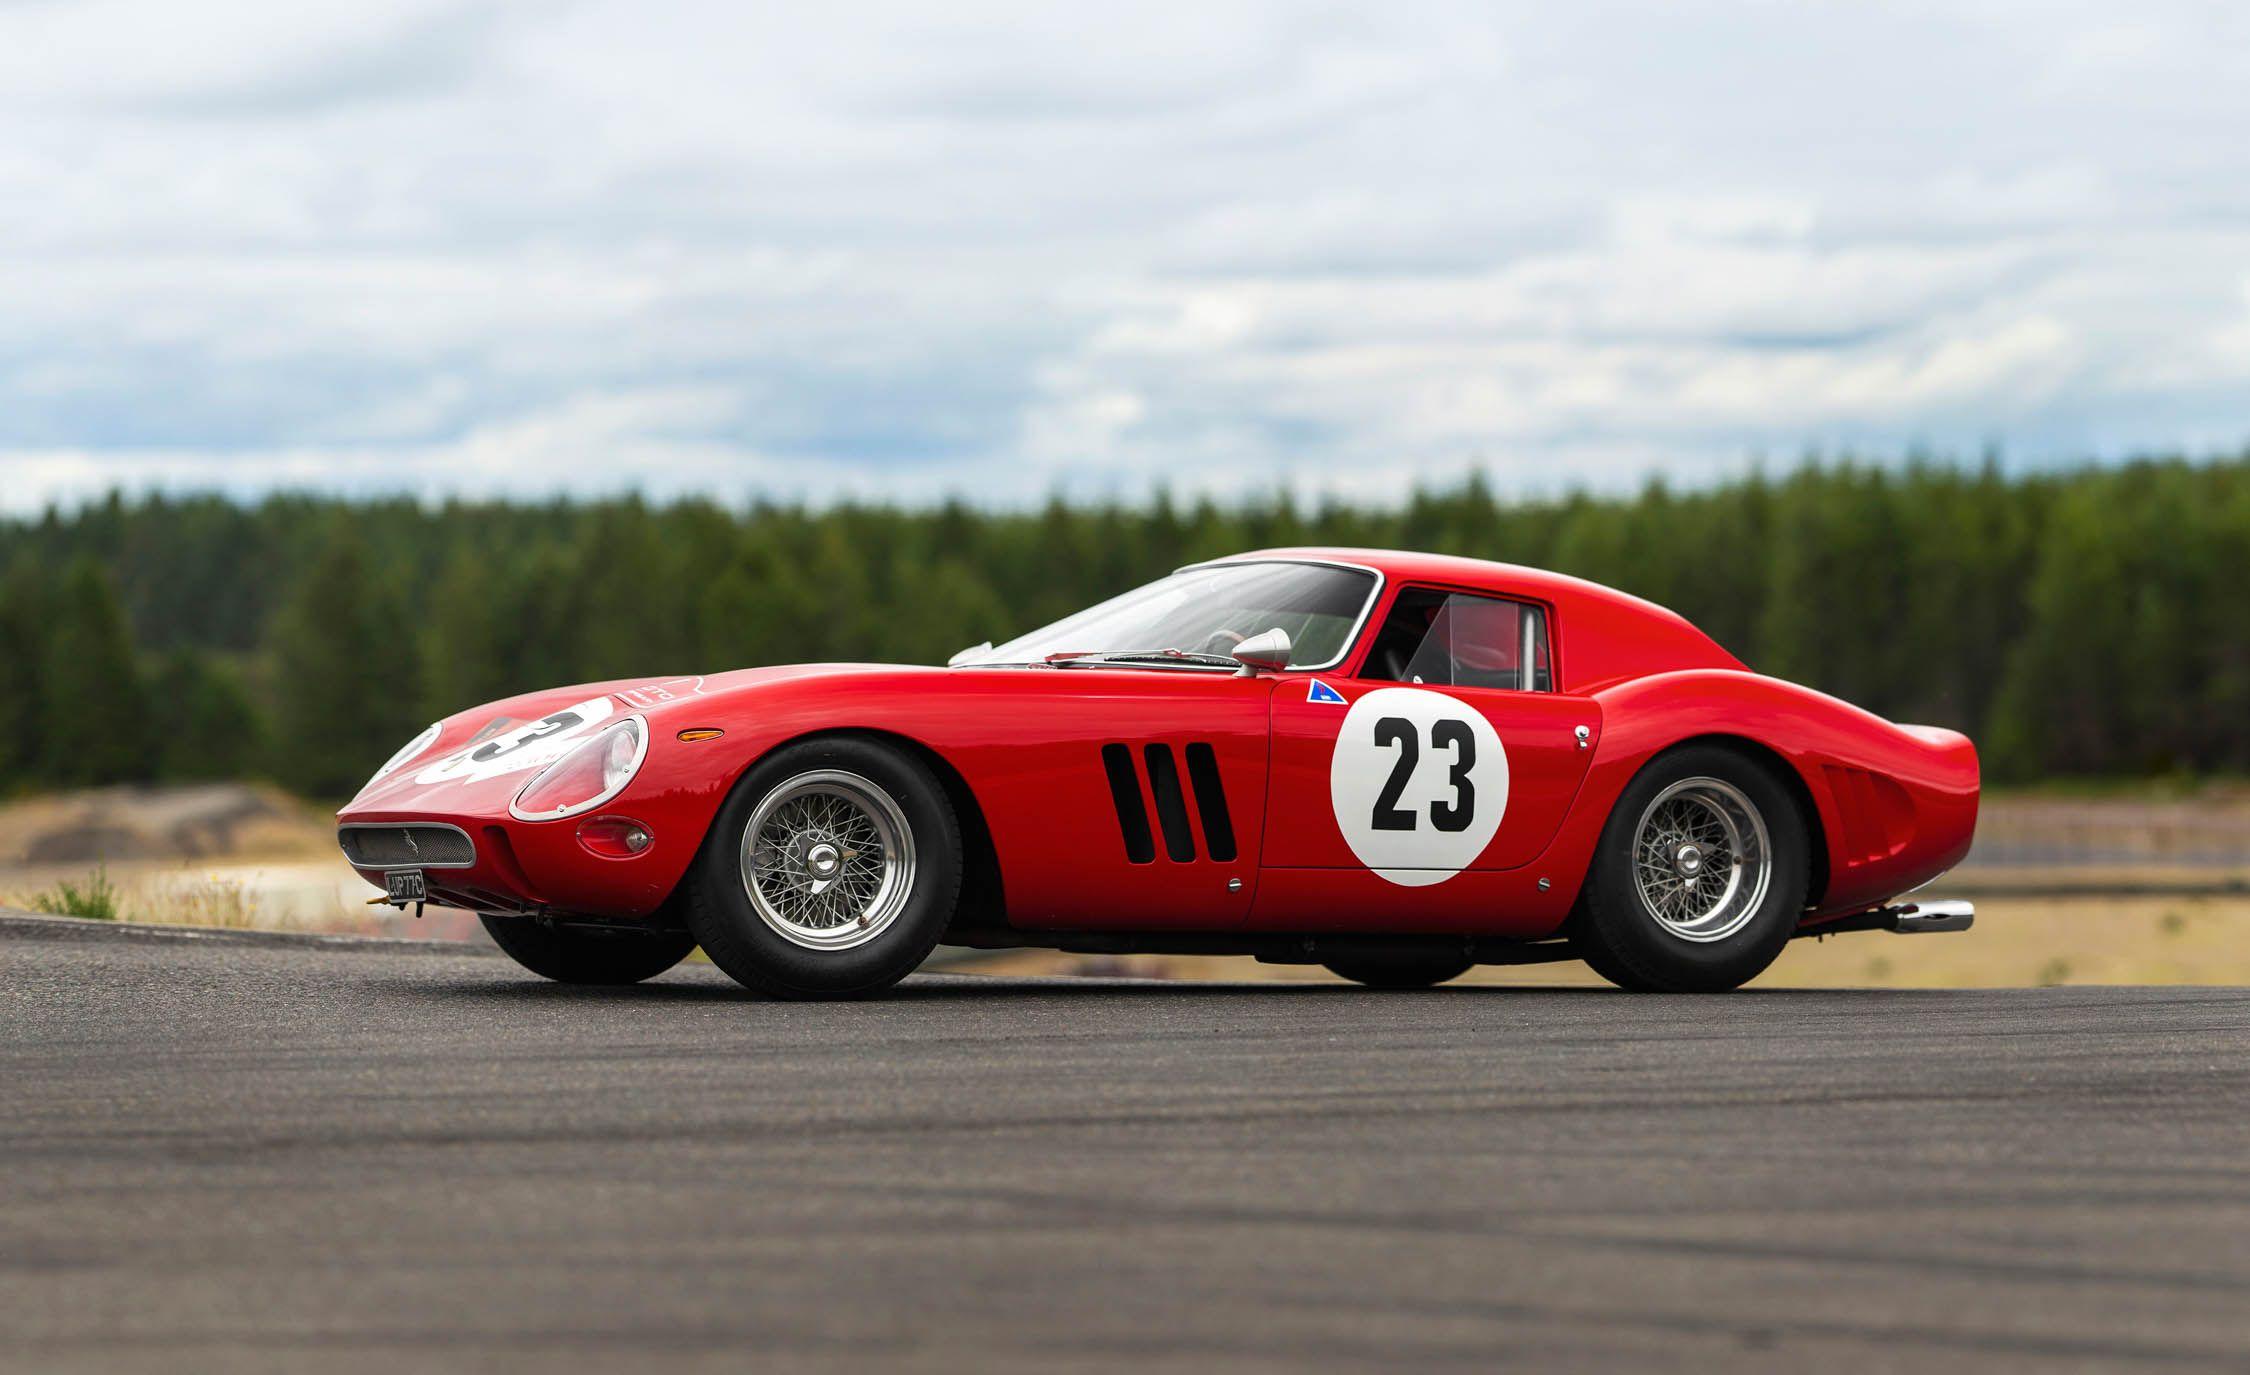 1962 Ferrari 250gto Sets World Record For Auction Price